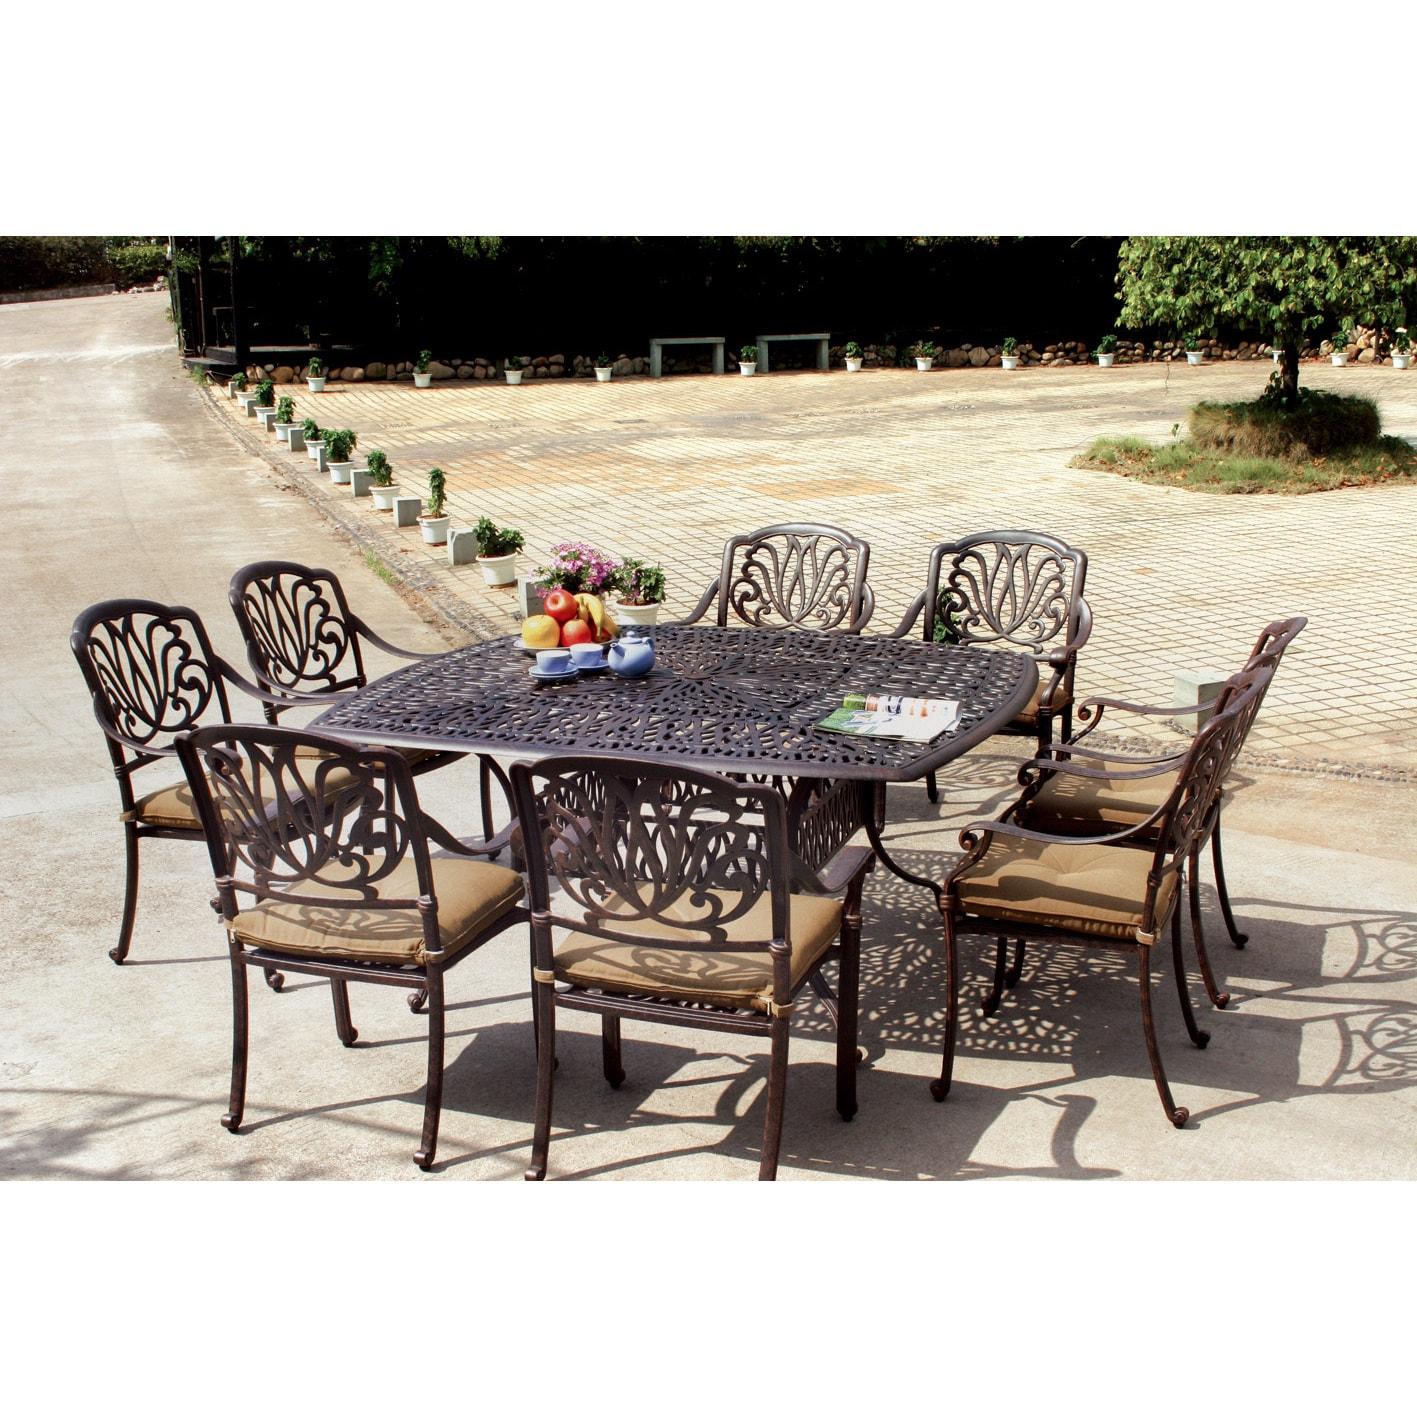 Etonnant Gracewood Hollow Shonagon Antique Bronze Cast Aluminum 9 Piece Dining Set  With Seat Cushions